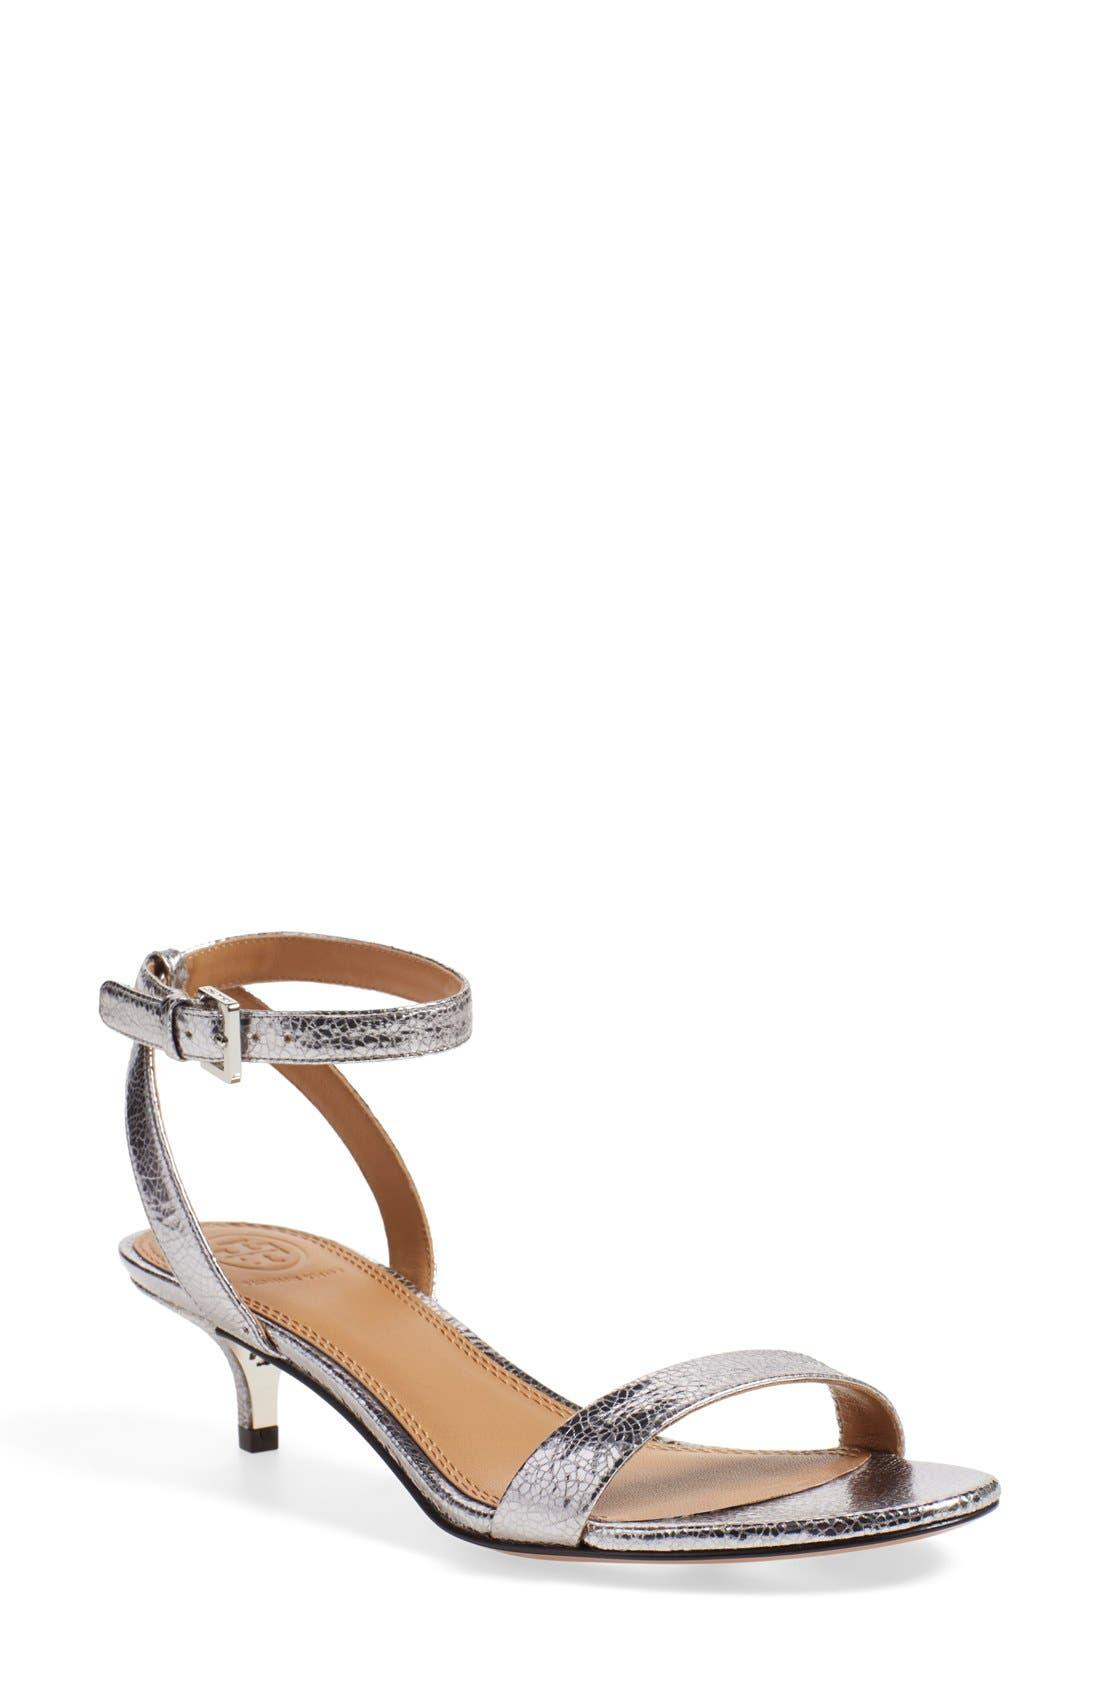 'Elana' Ankle Strap Sandal,                             Main thumbnail 1, color,                             043